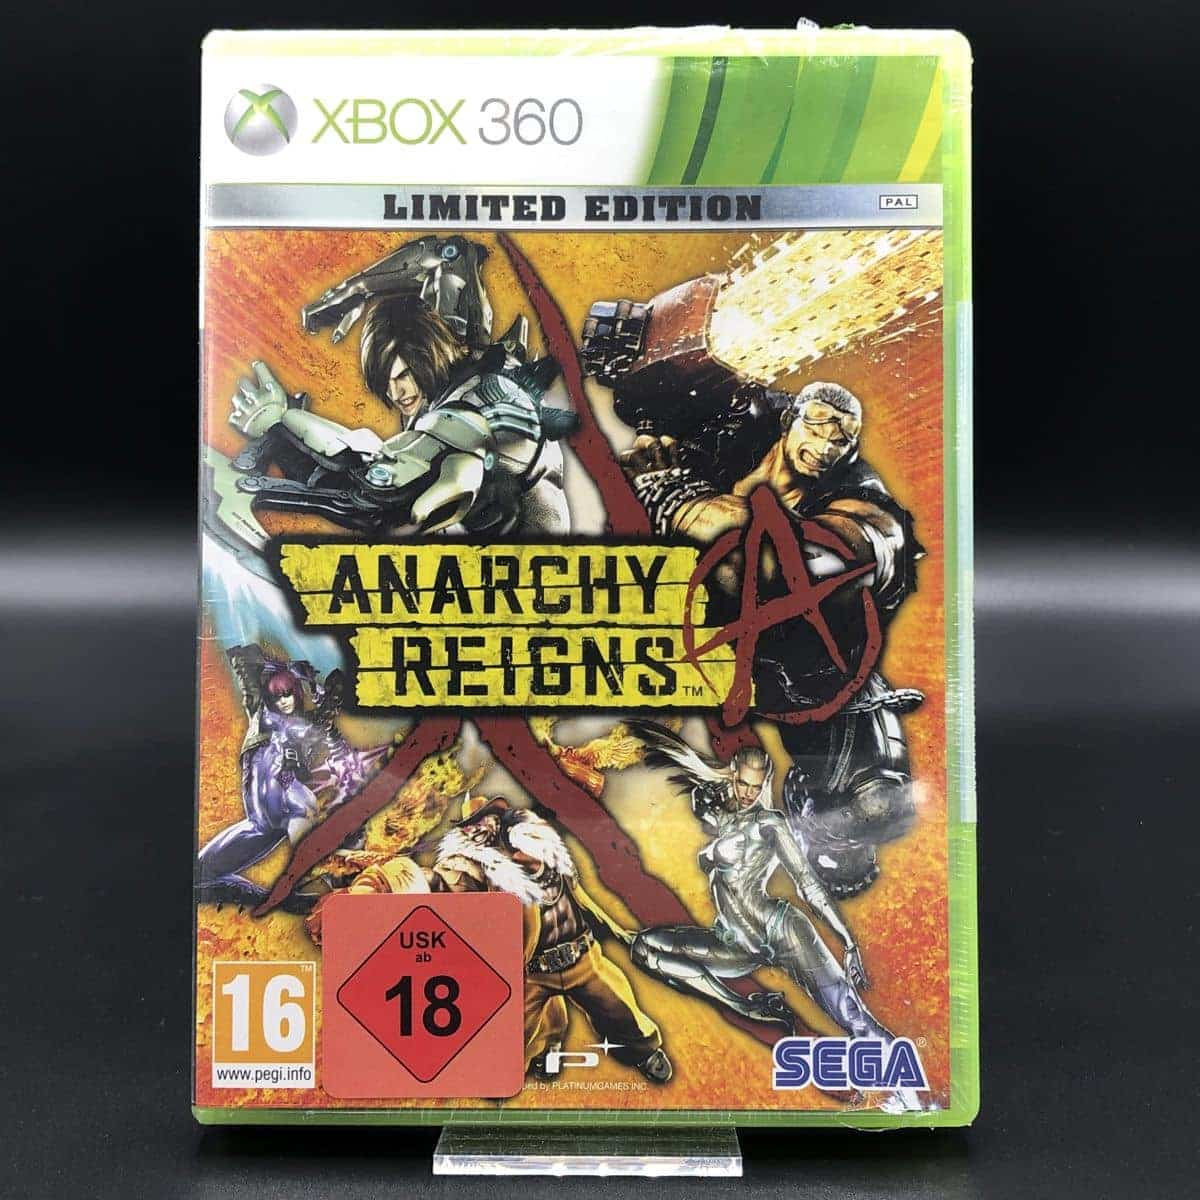 Anarchy Reigns (NEU) XBOX 360 (FSK18)